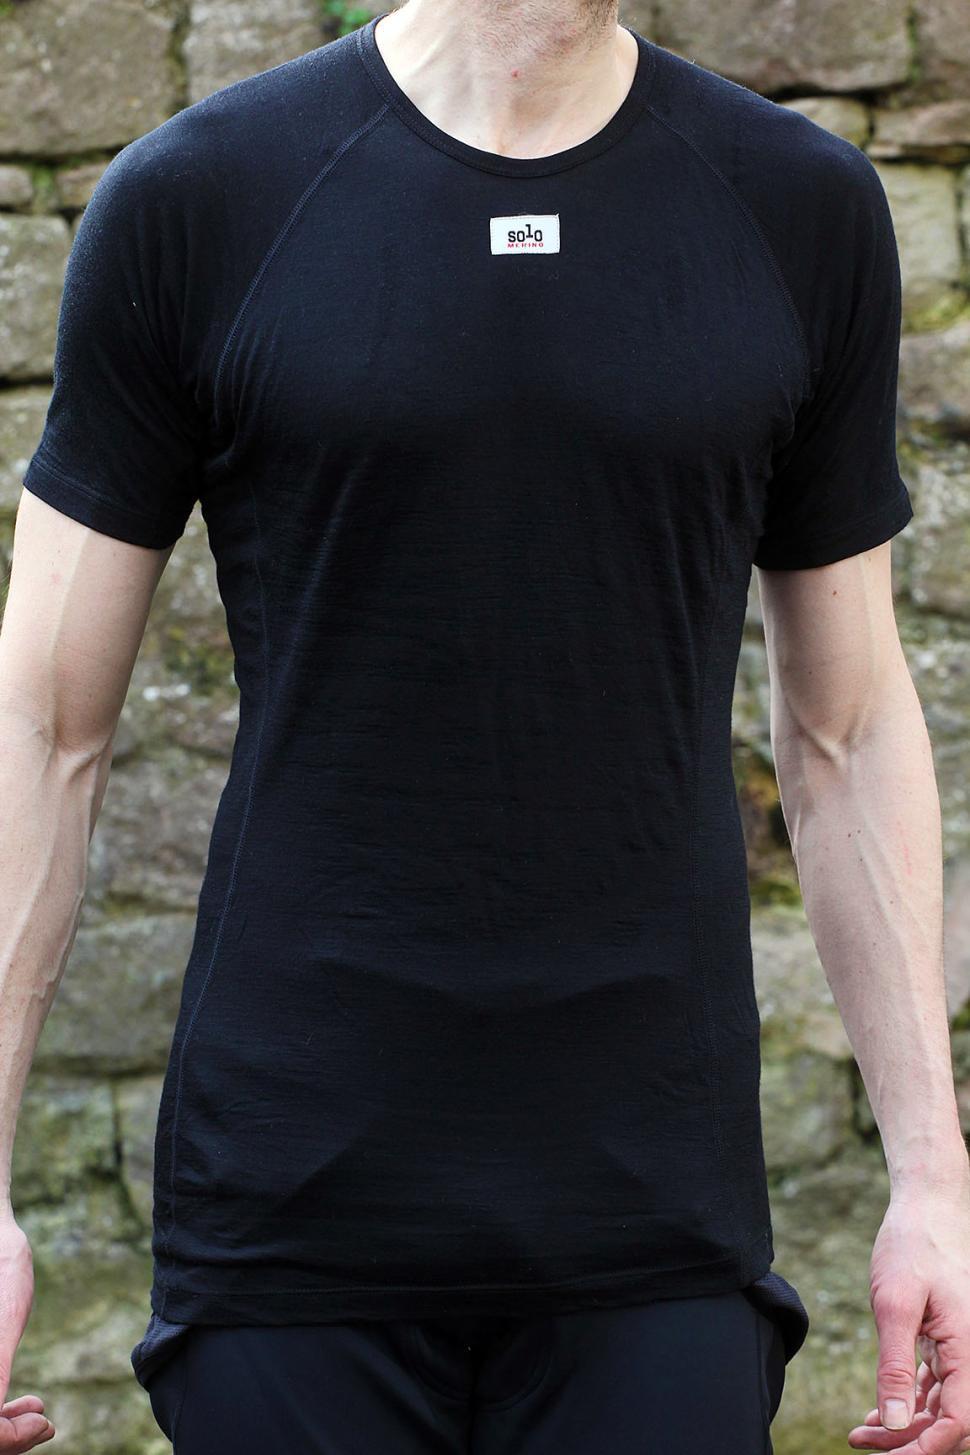 Solo Merino short sleeve base layer